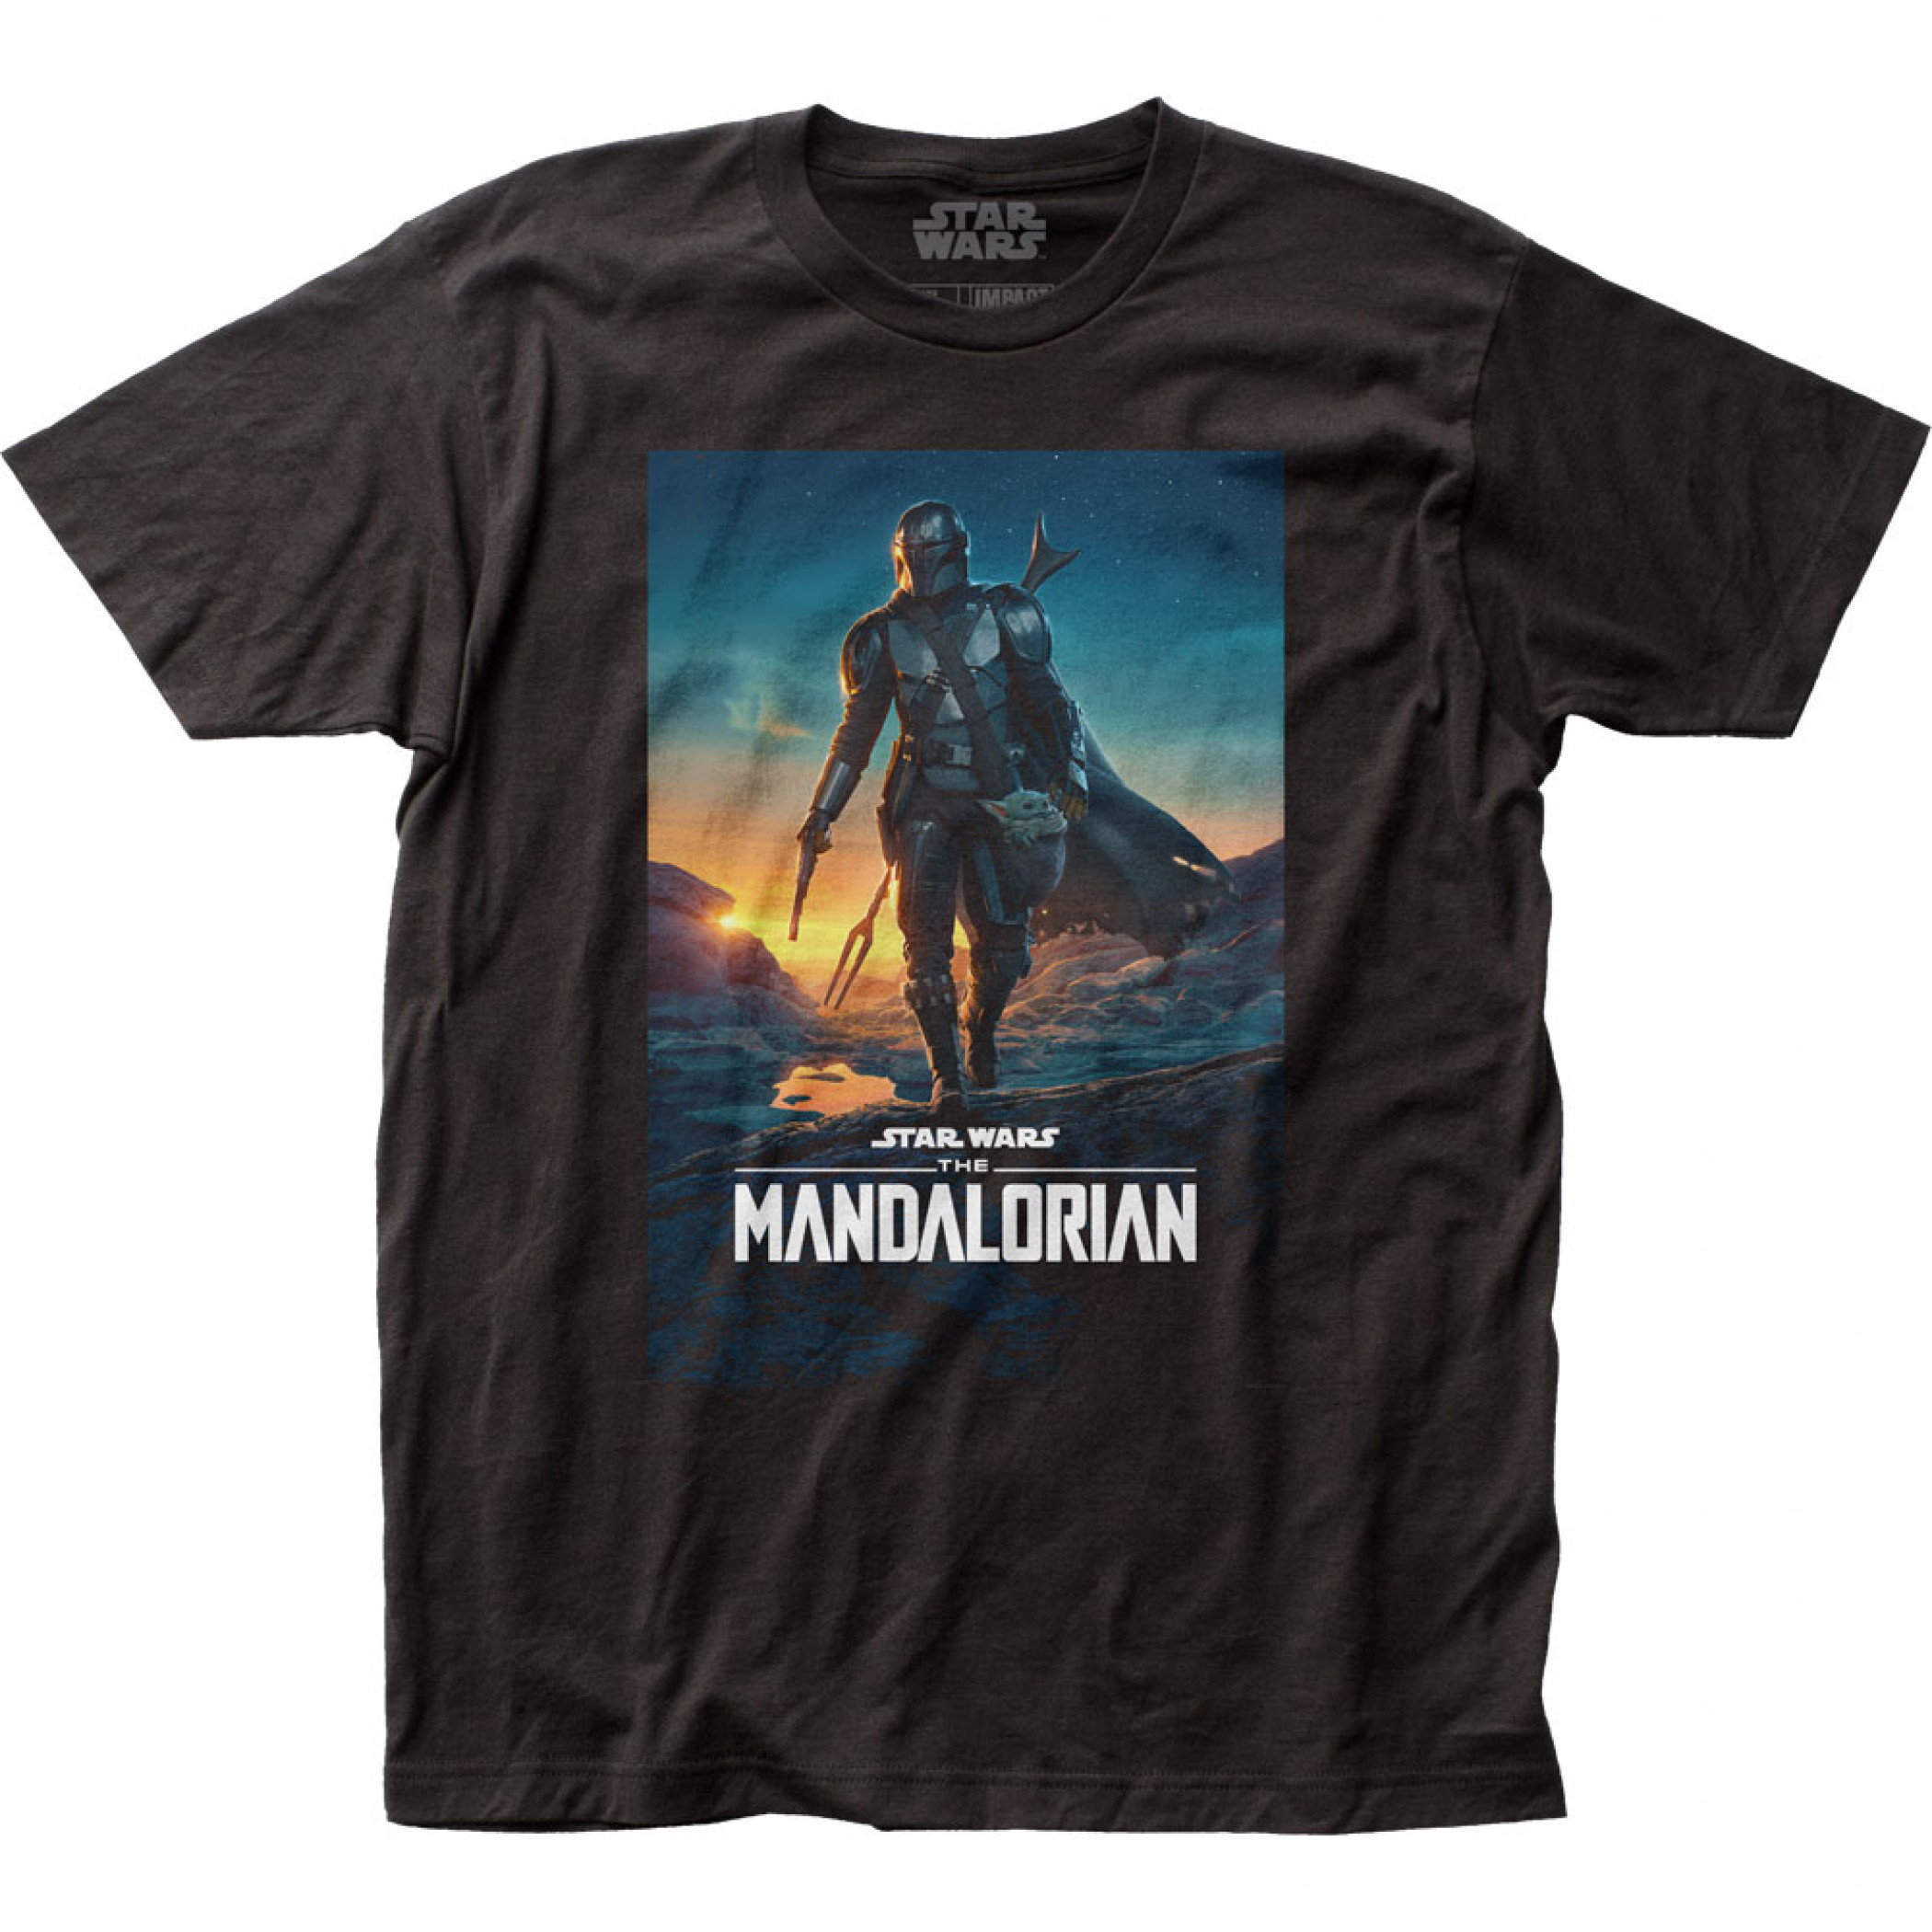 Star Wars The Mandalorian Season 2 Poster T-Shirt